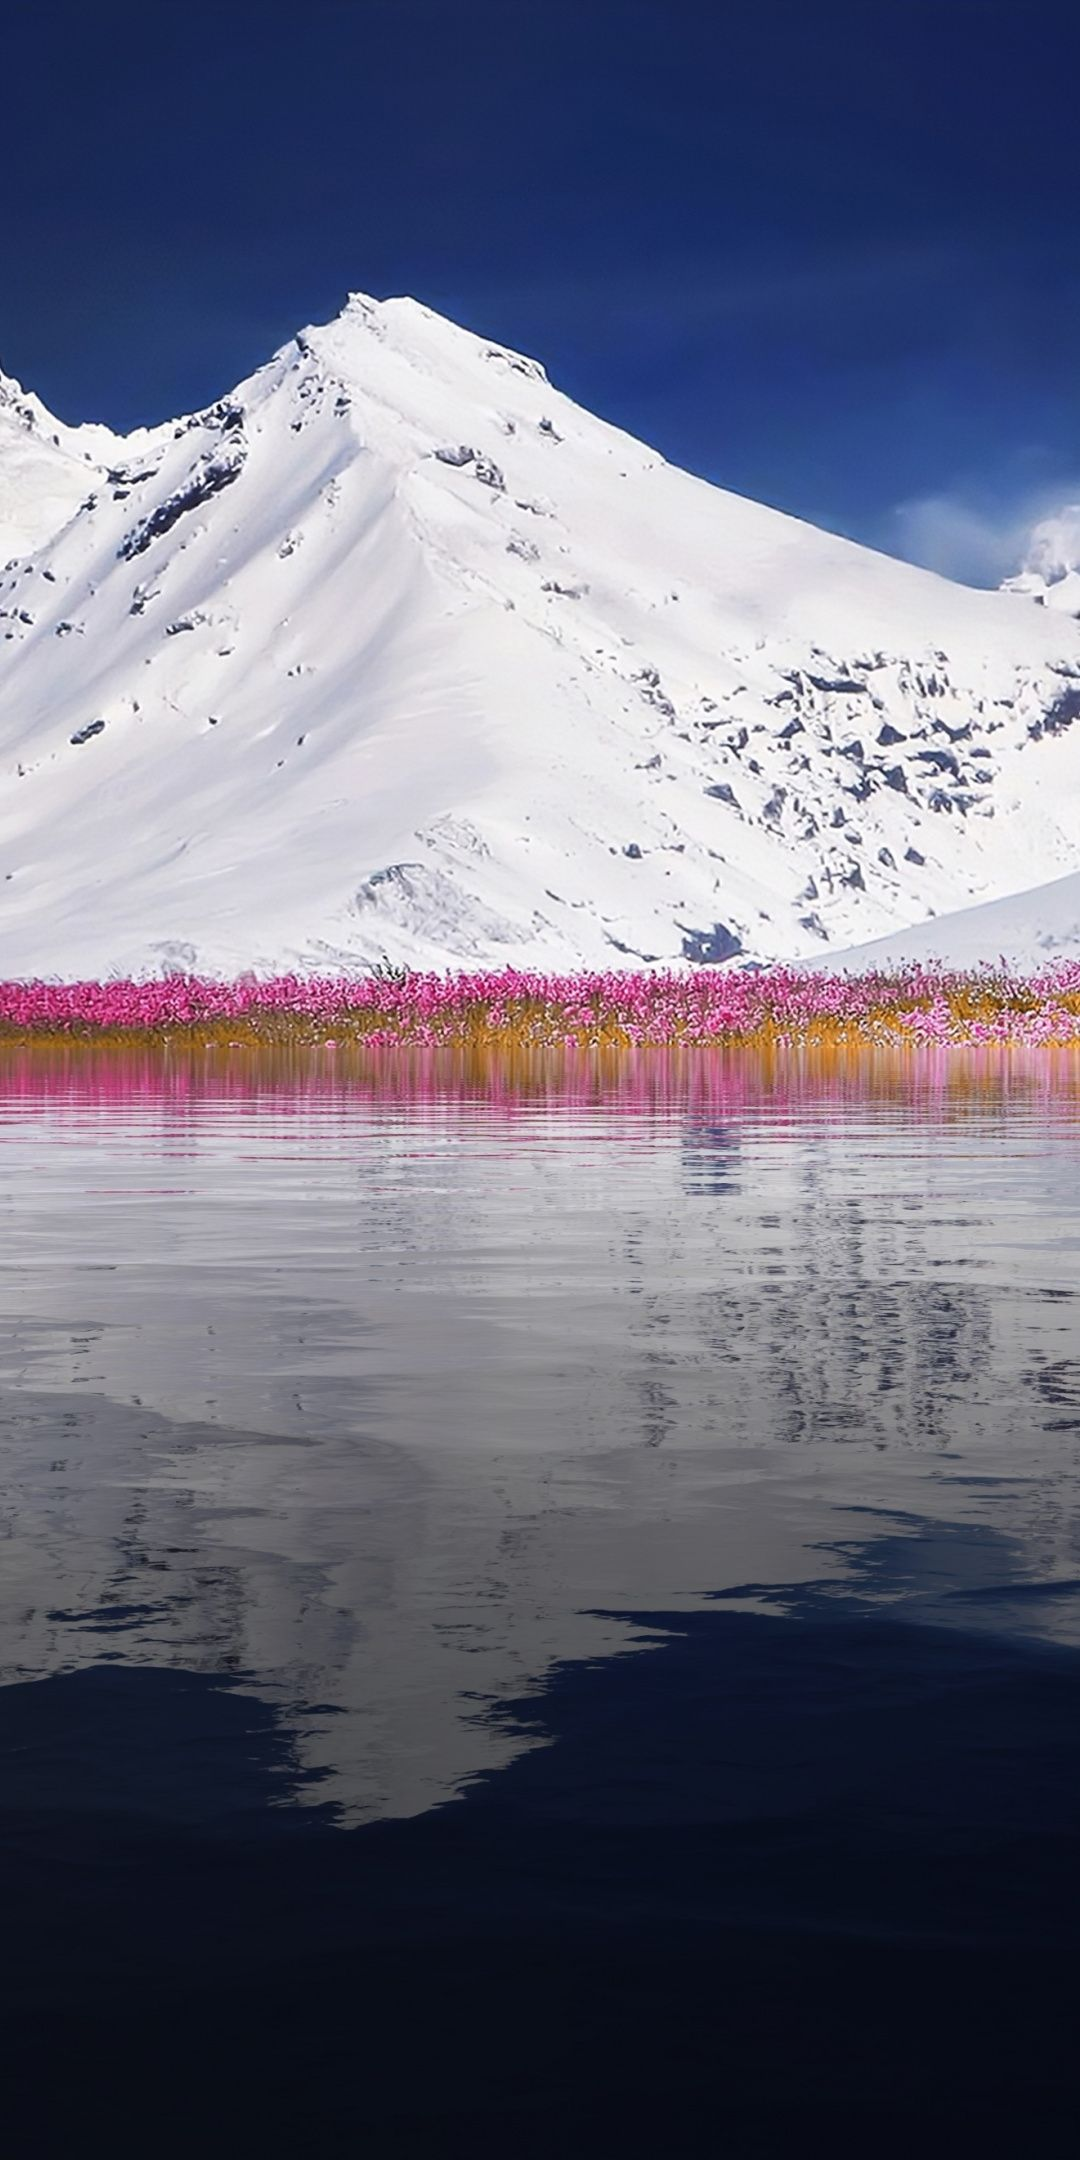 Mountains Winter Landscape Lake Reflections Nature 1080x2160 Wallpaper Lake Landscape Mountain Landscape Winter Mountain